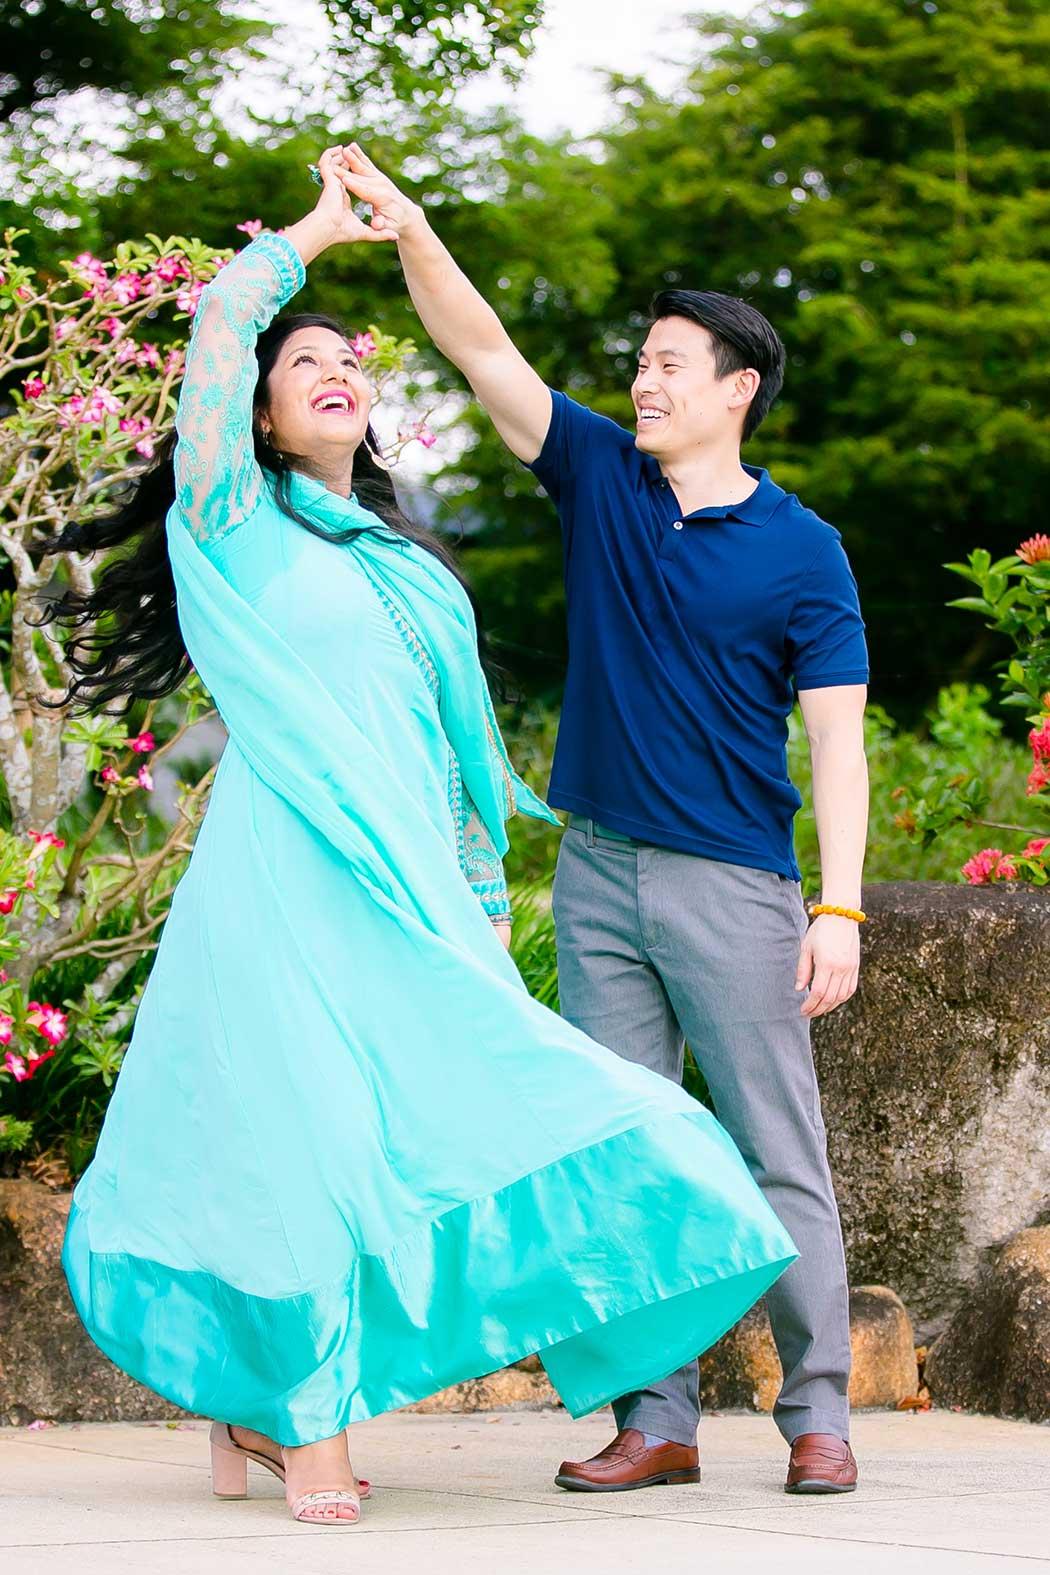 engagement photography at morikami | couple dancing during engagement photoshoot | dancing at morikami japanese gardens